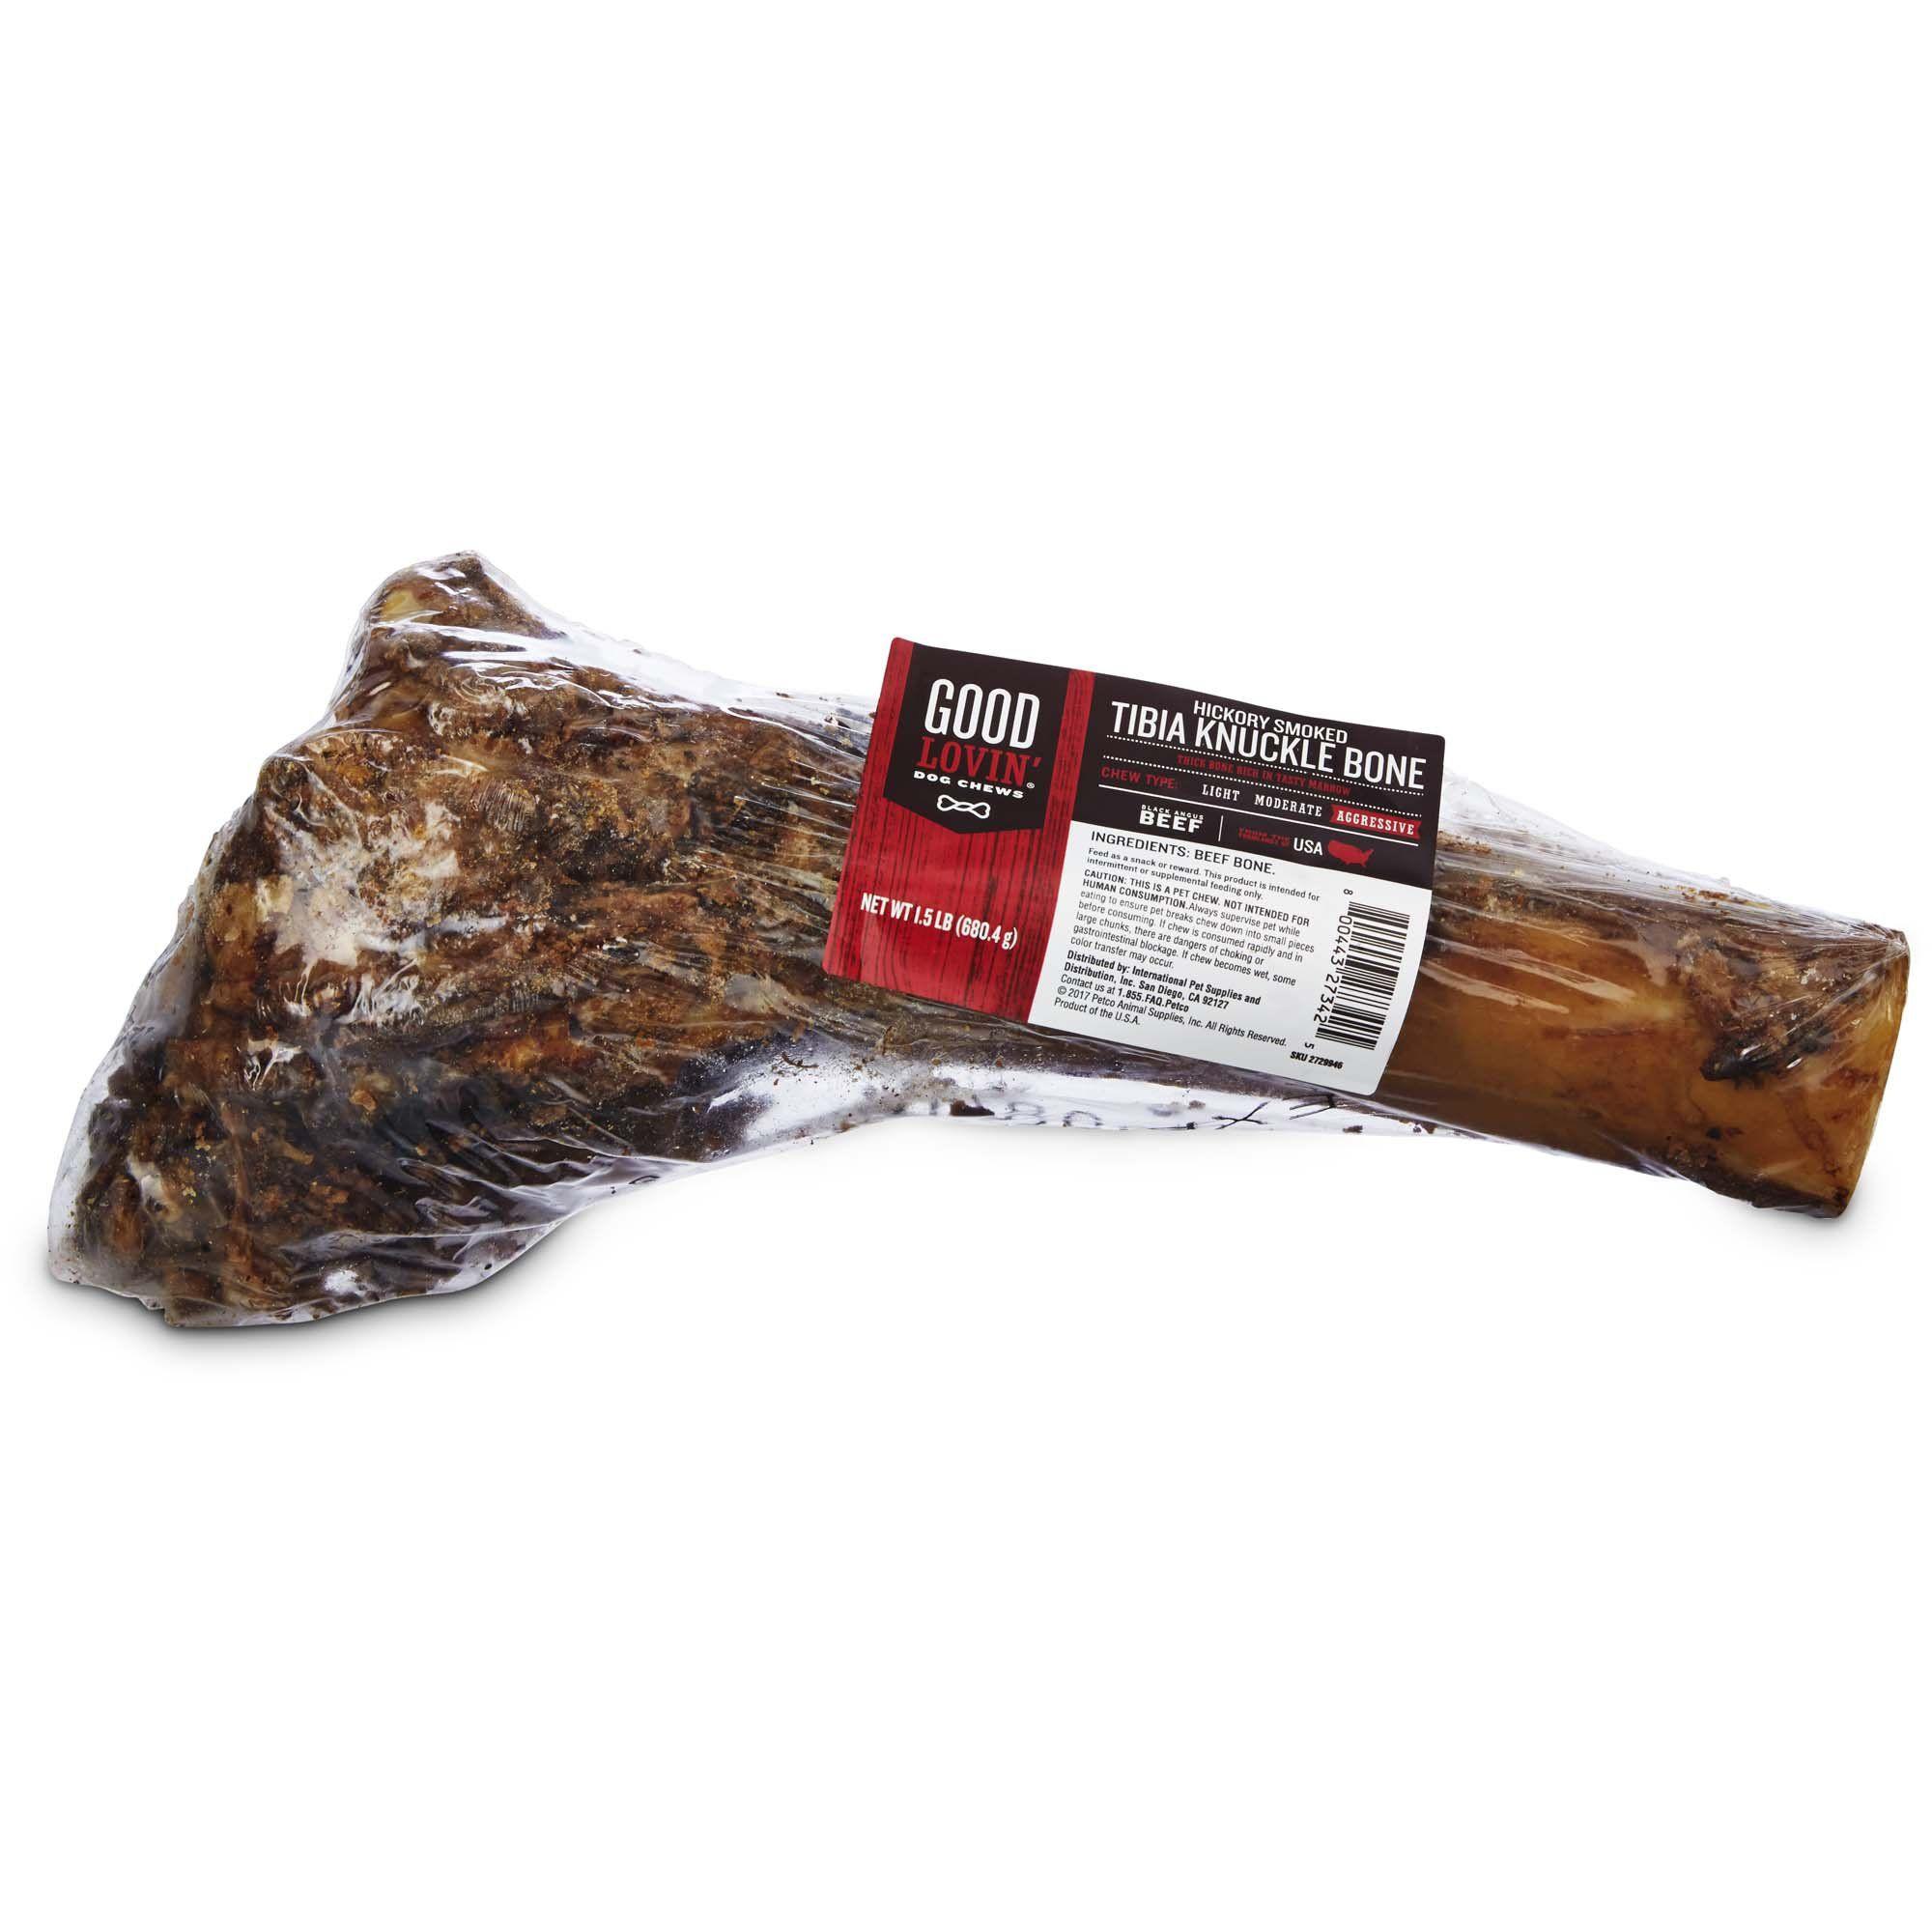 Good Lovin Hickory Smoked Tibia Knuckle Bone Dog Chew 1 5 Lbs